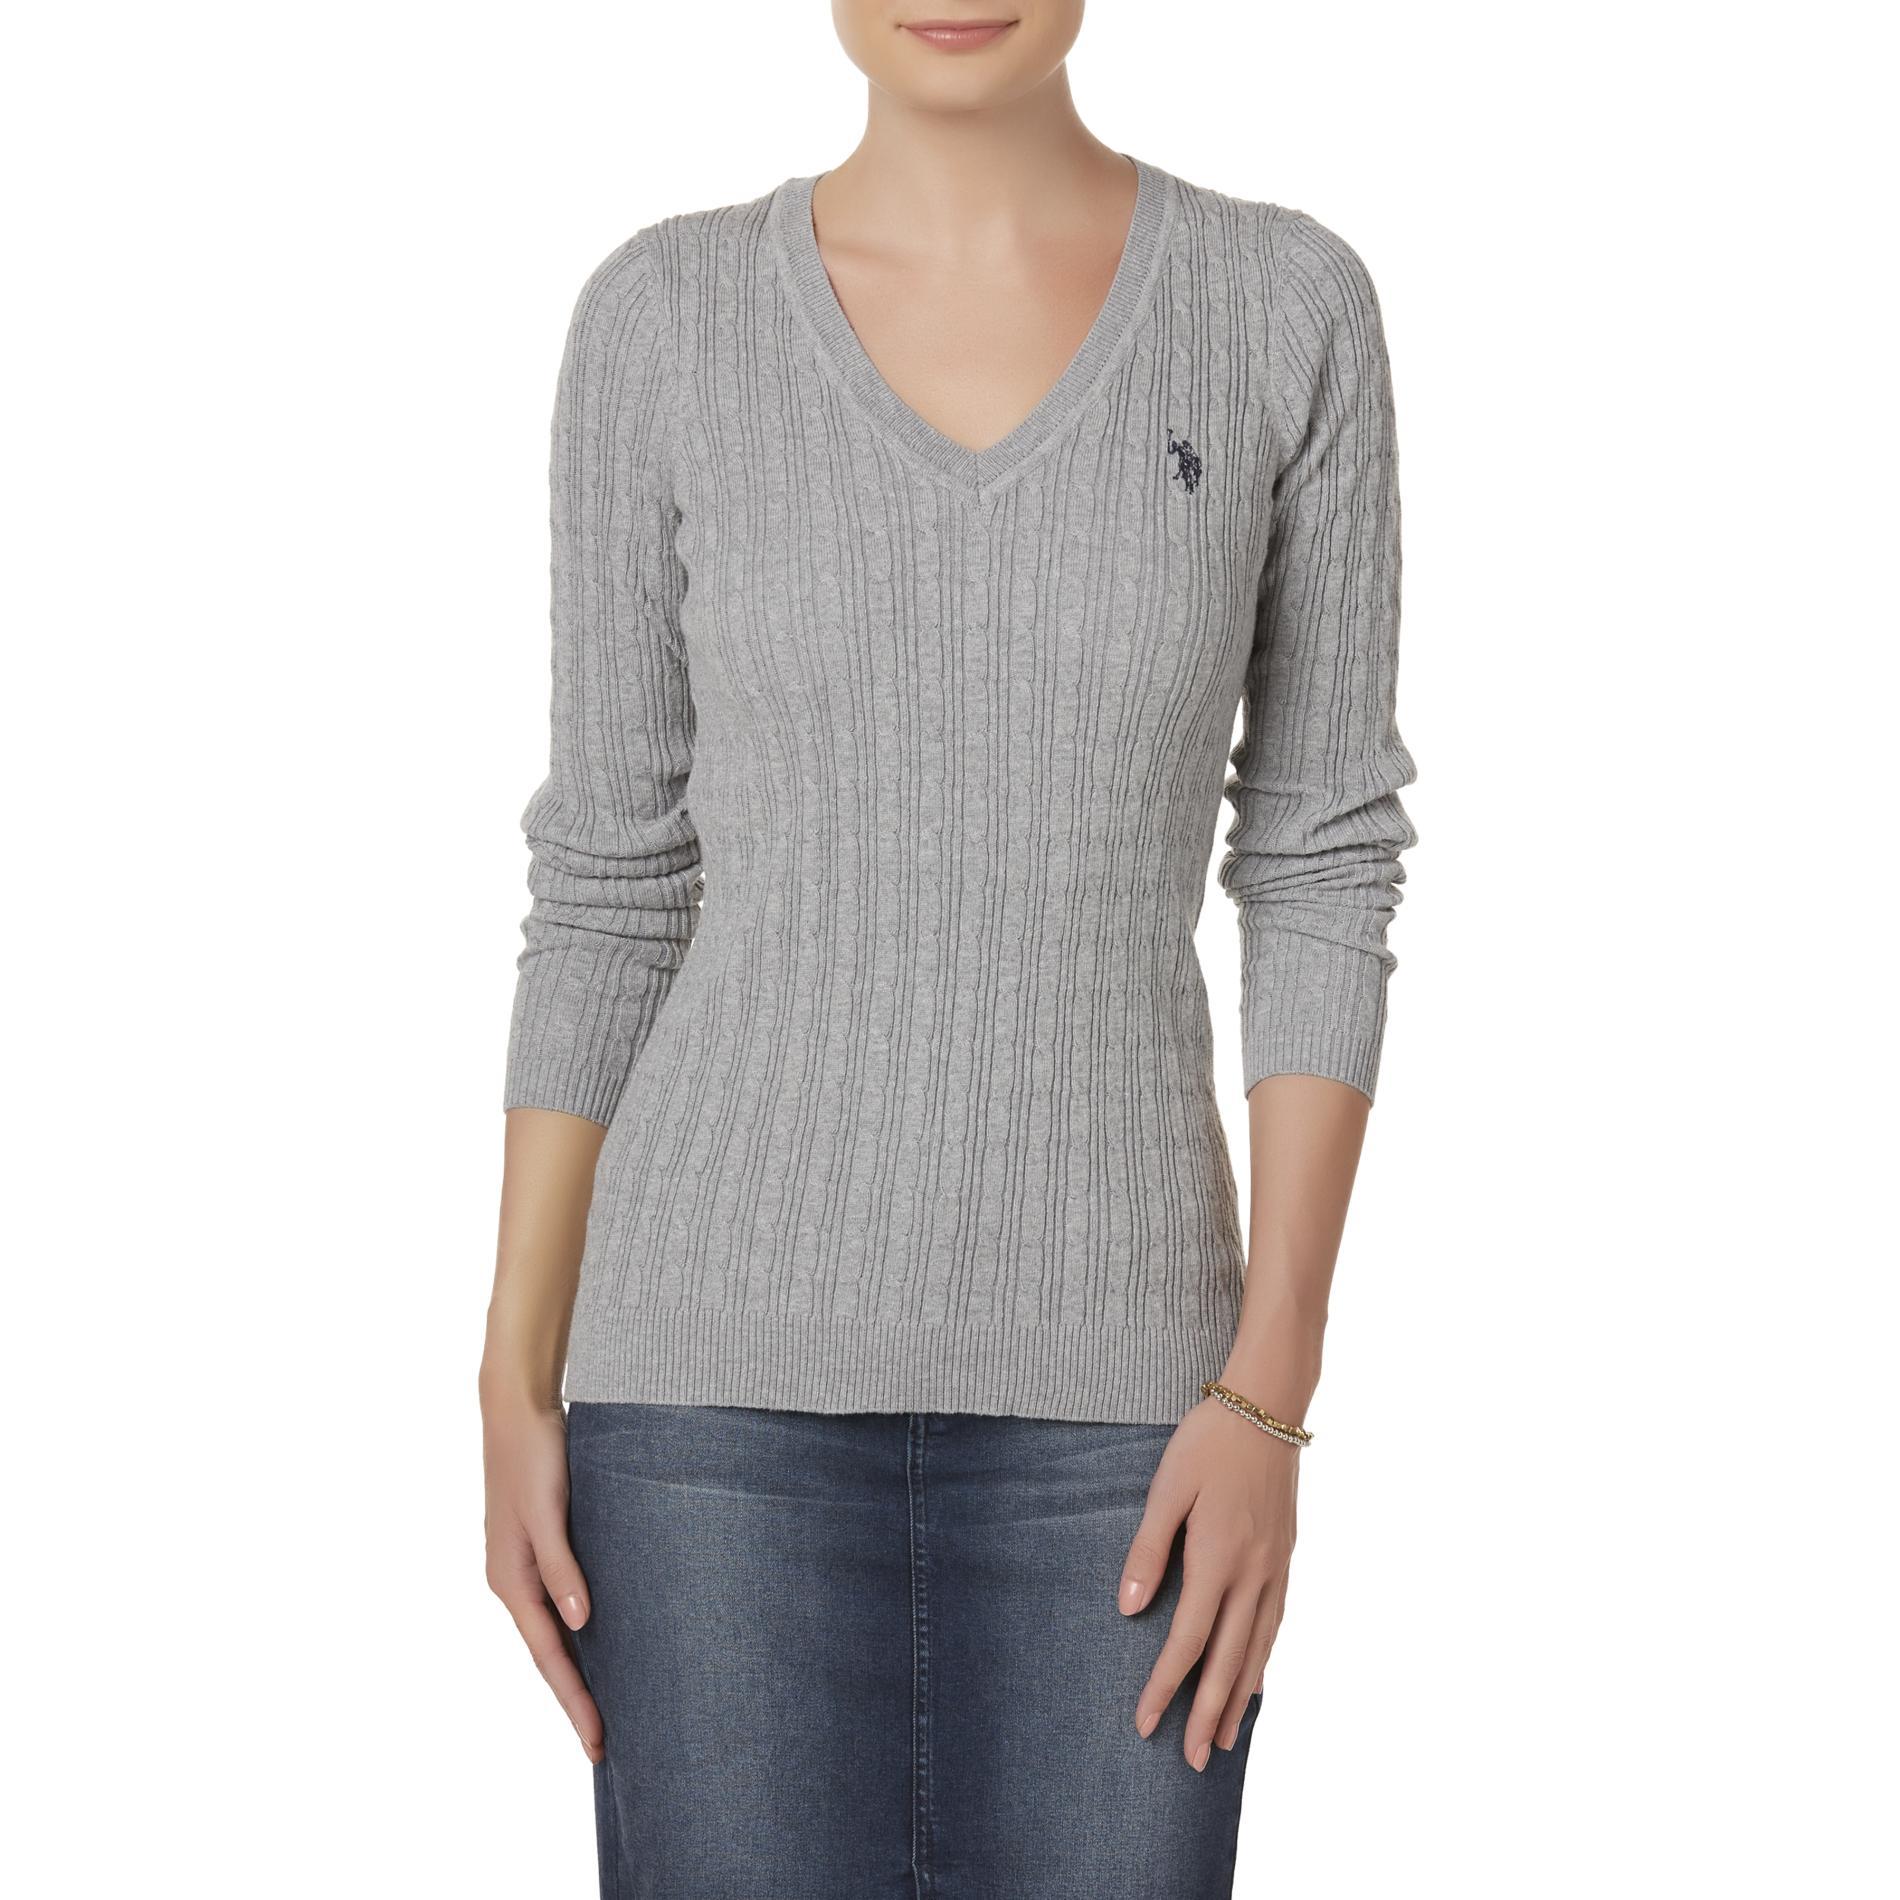 U.S. Polo Assn. Juniors' V-Neck Cable Knit Sweater PartNumber: 002VA99285312P MfgPartNumber: US346SE